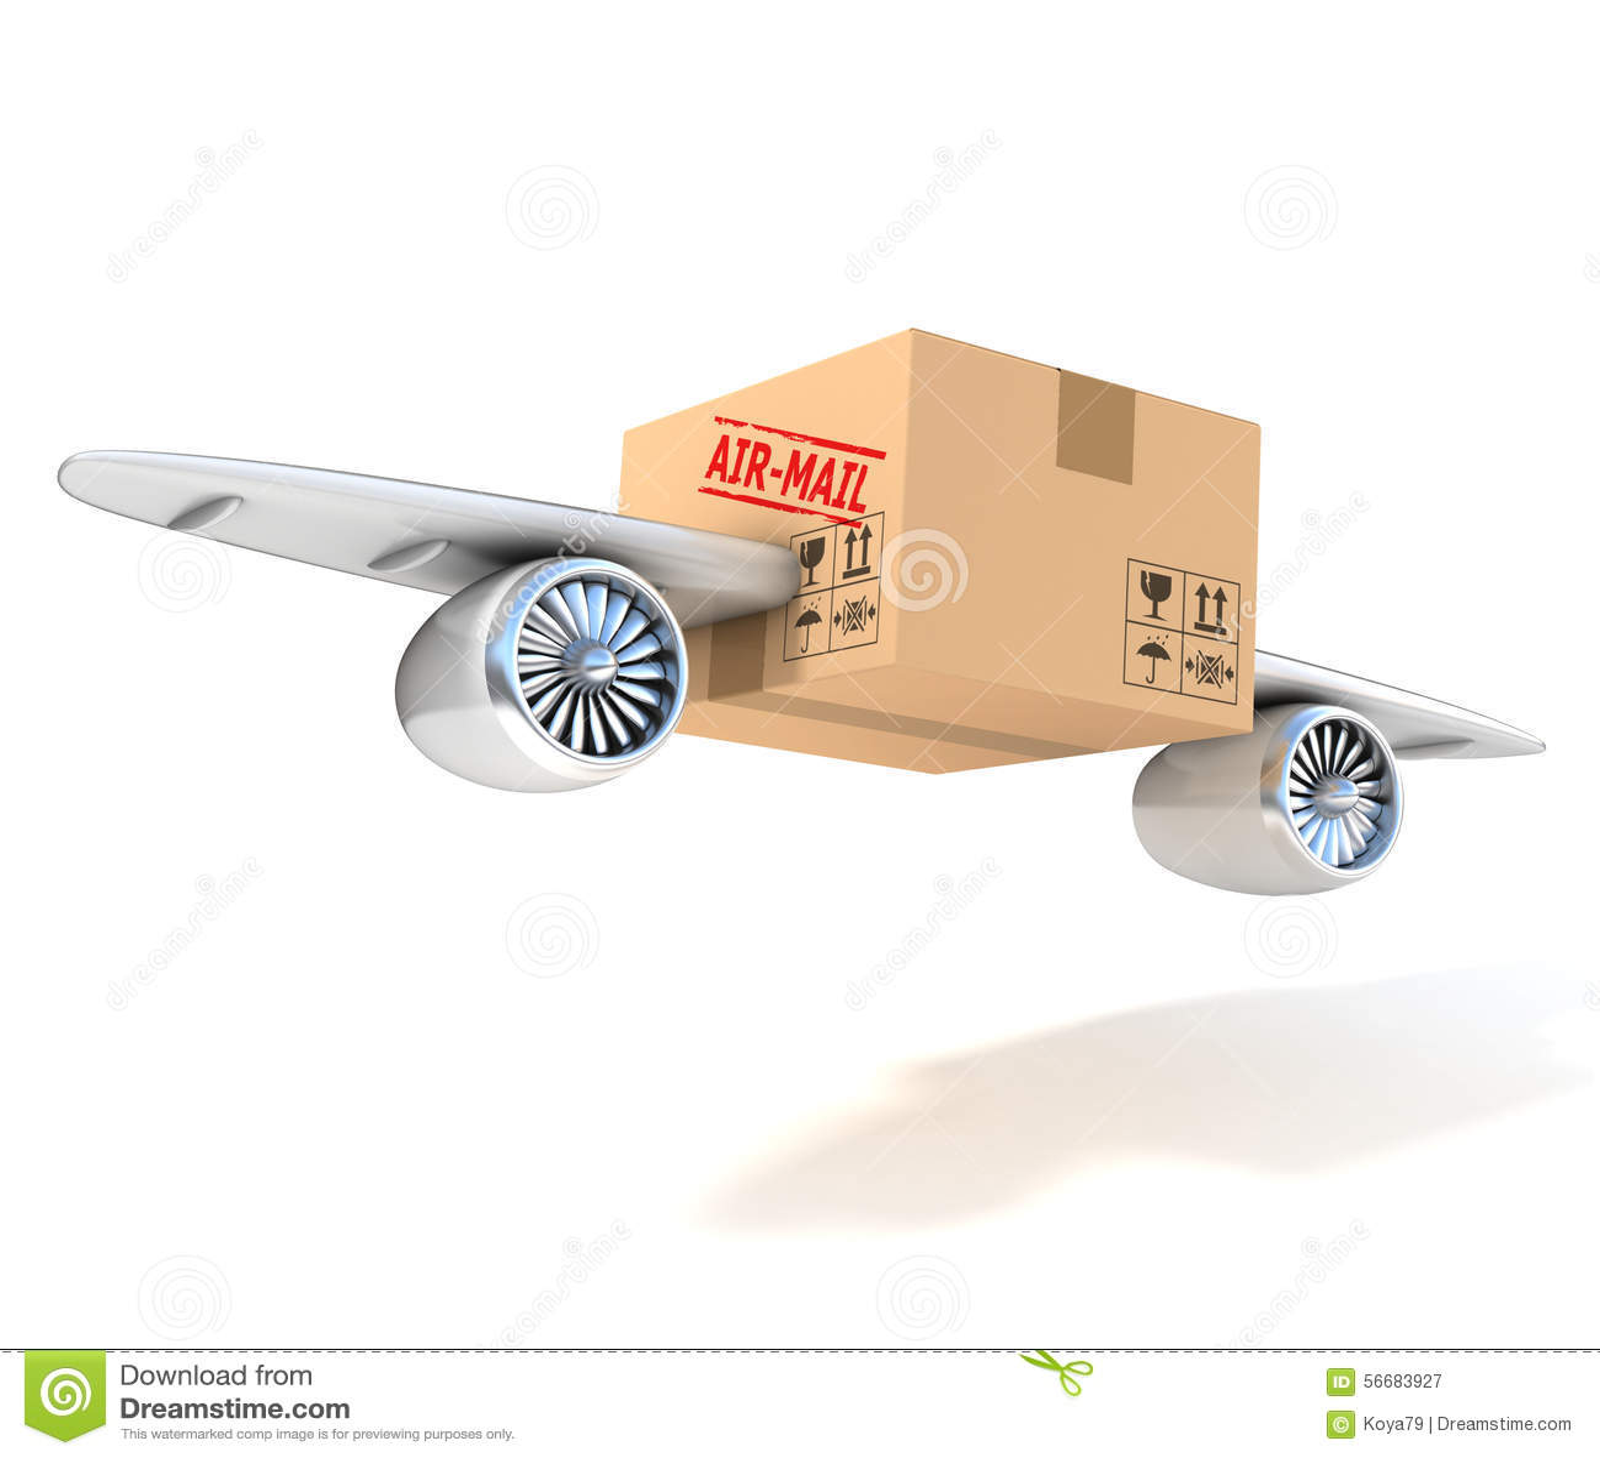 Air mail 3d concept